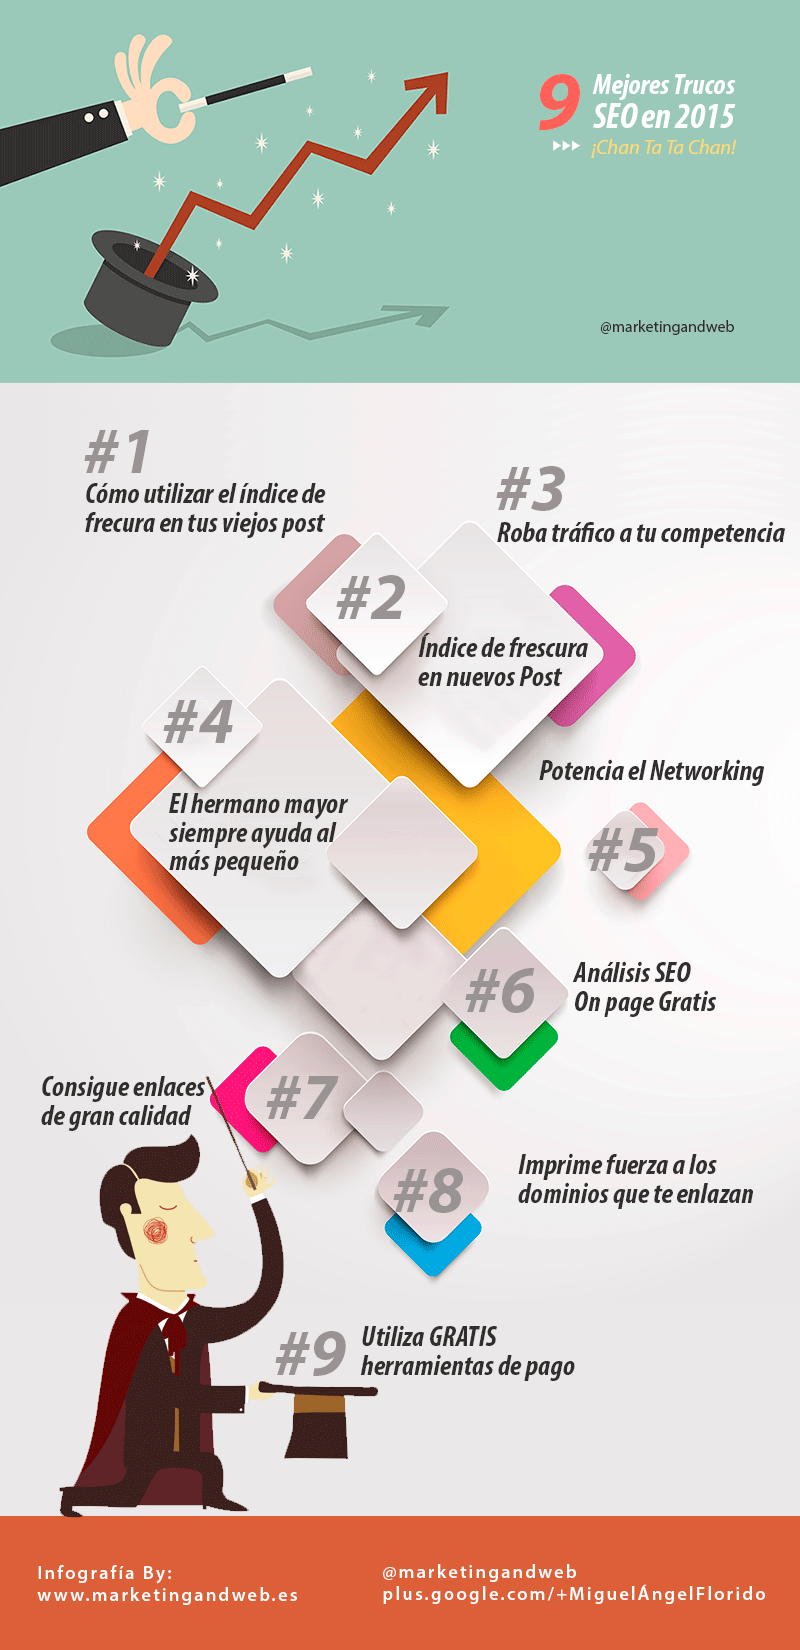 9 mejores trucos SEO para 2015